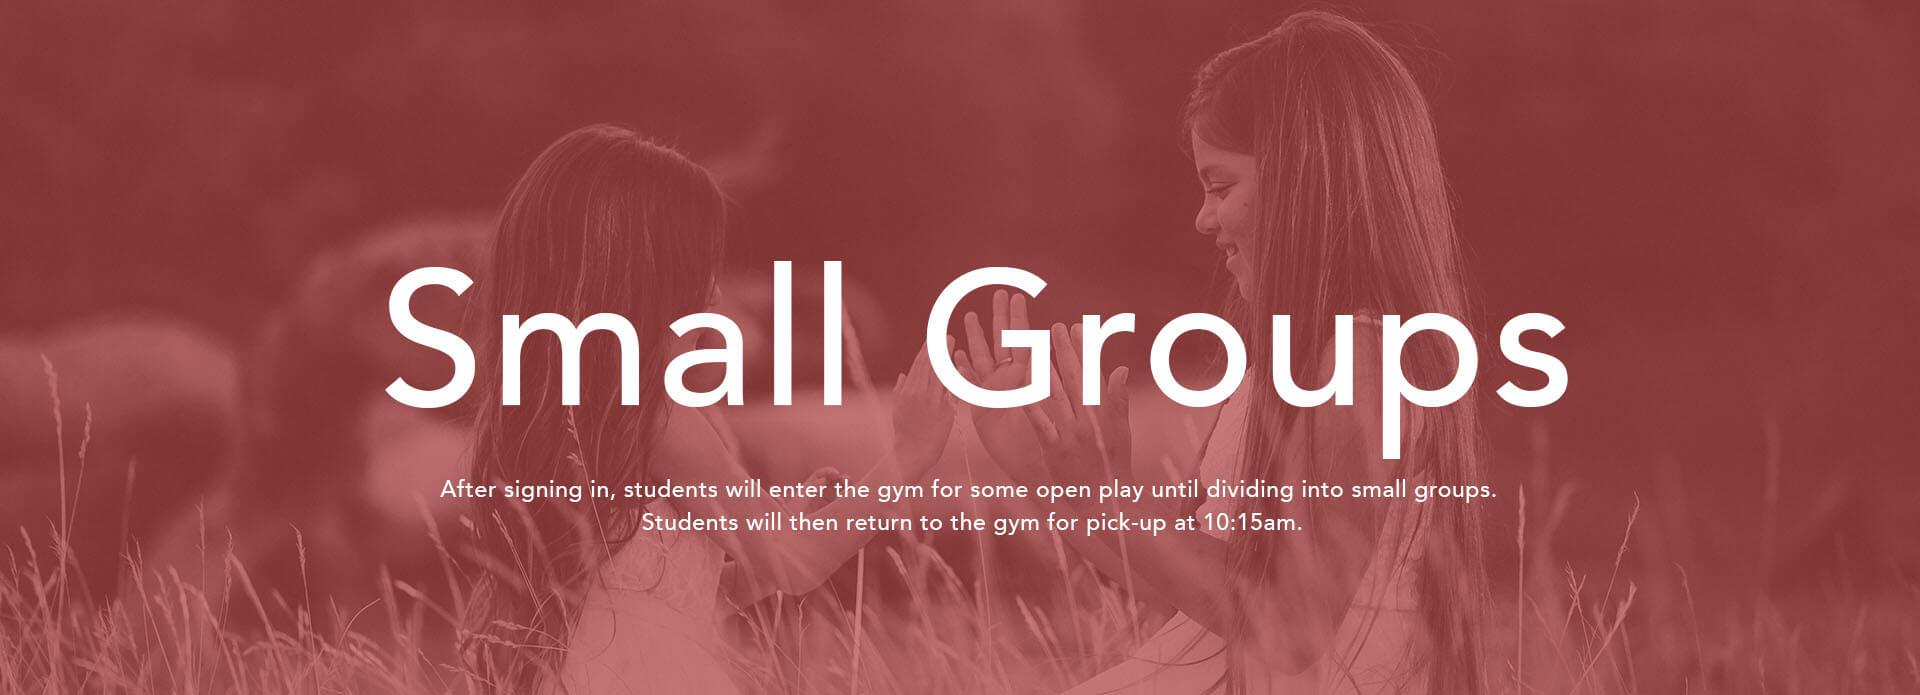 smallgroupskids